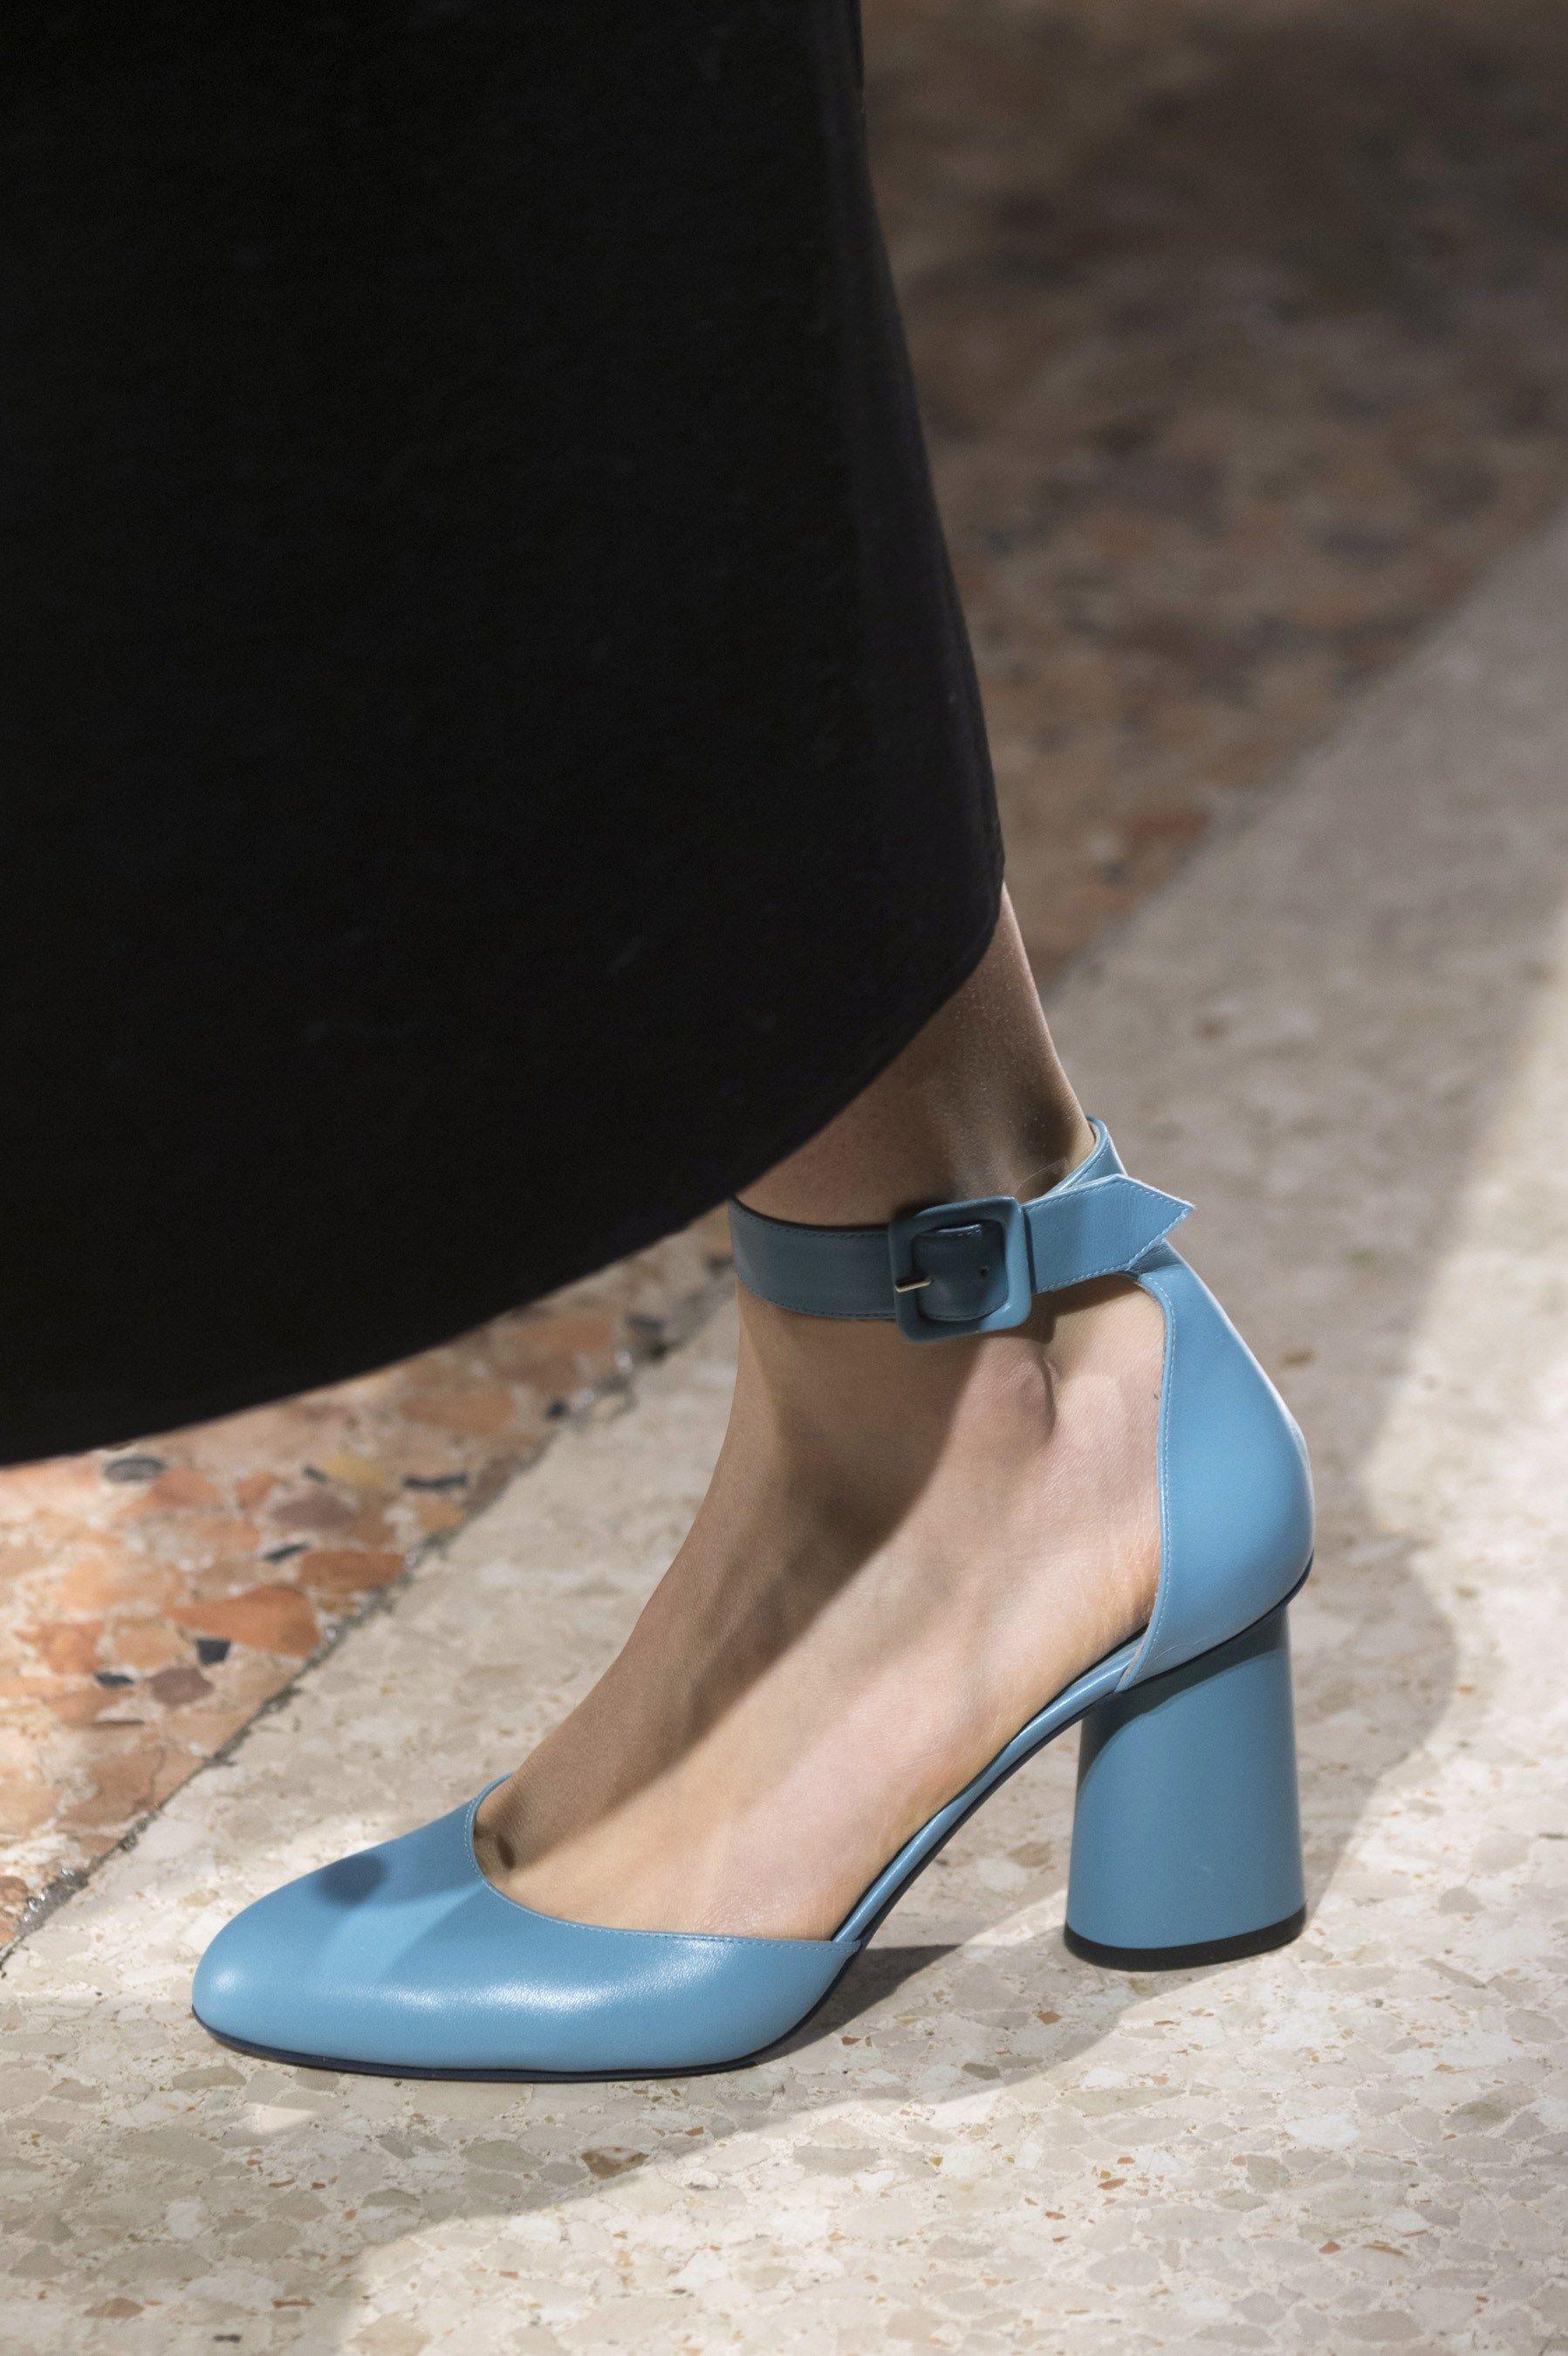 Anteprima Clp Rf18 5772 The Impression Fashion Shoes Trending Shoes Shoes